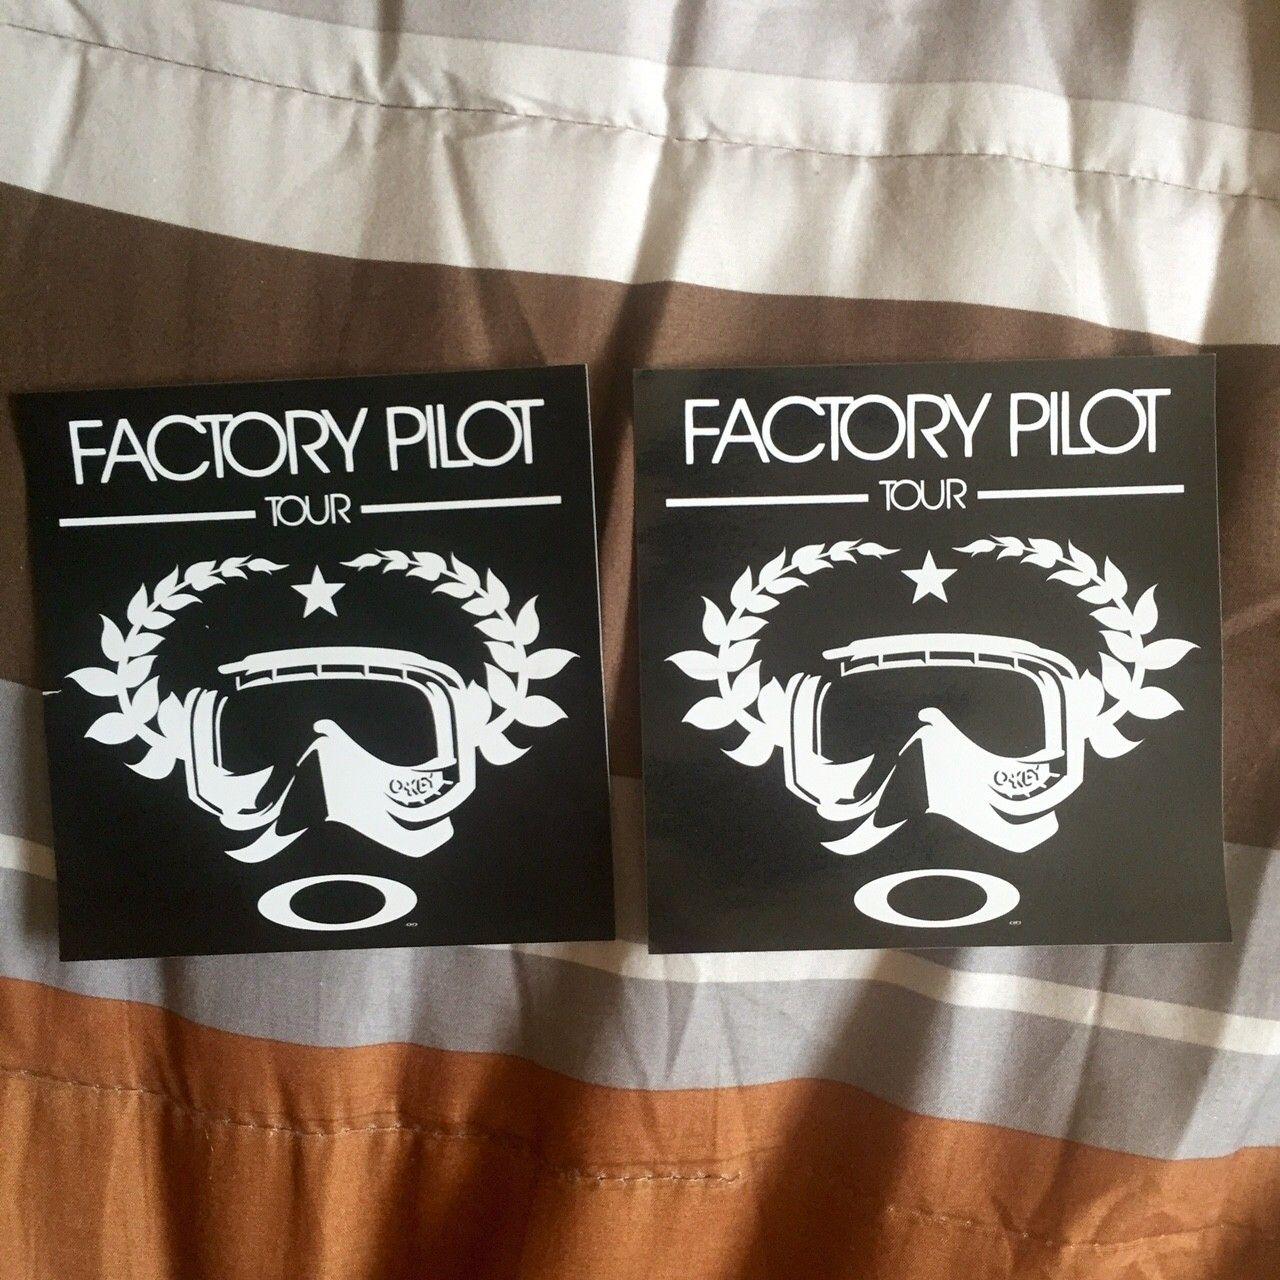 Factory Pilot Tour Stickers - FullSizeRender.jpg